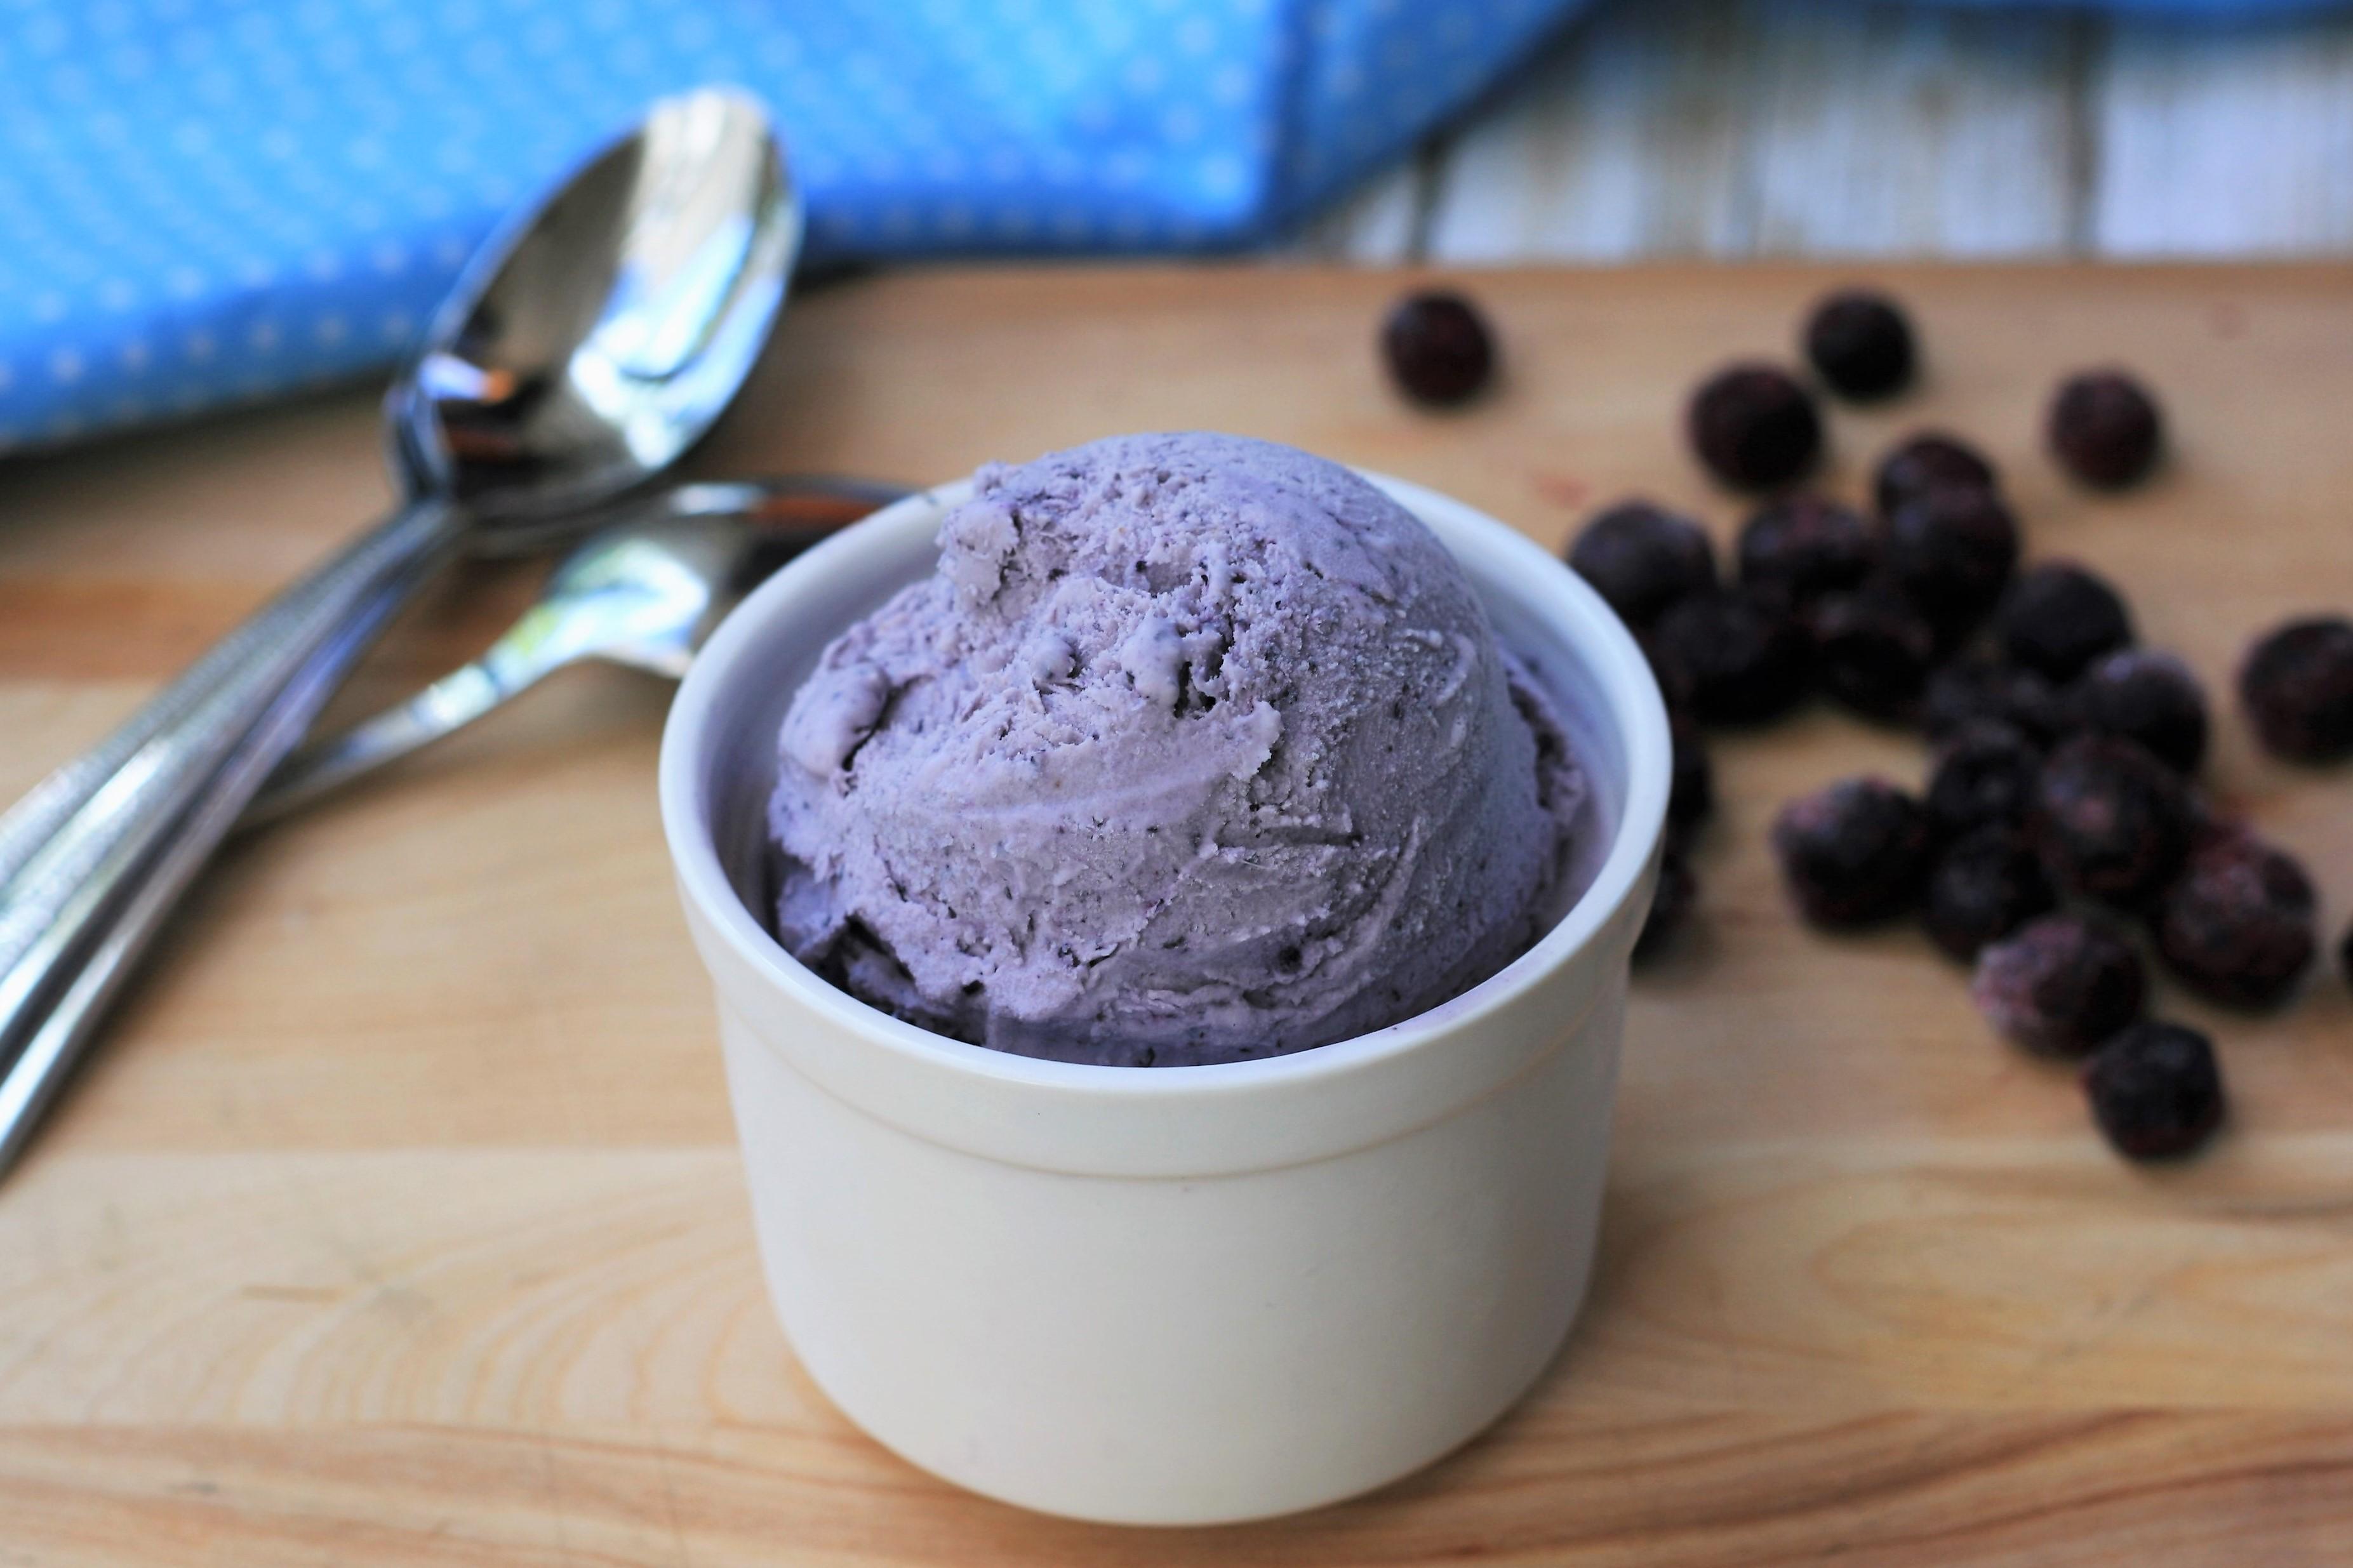 Keto No-Churn Blueberry-Maple Ice Cream